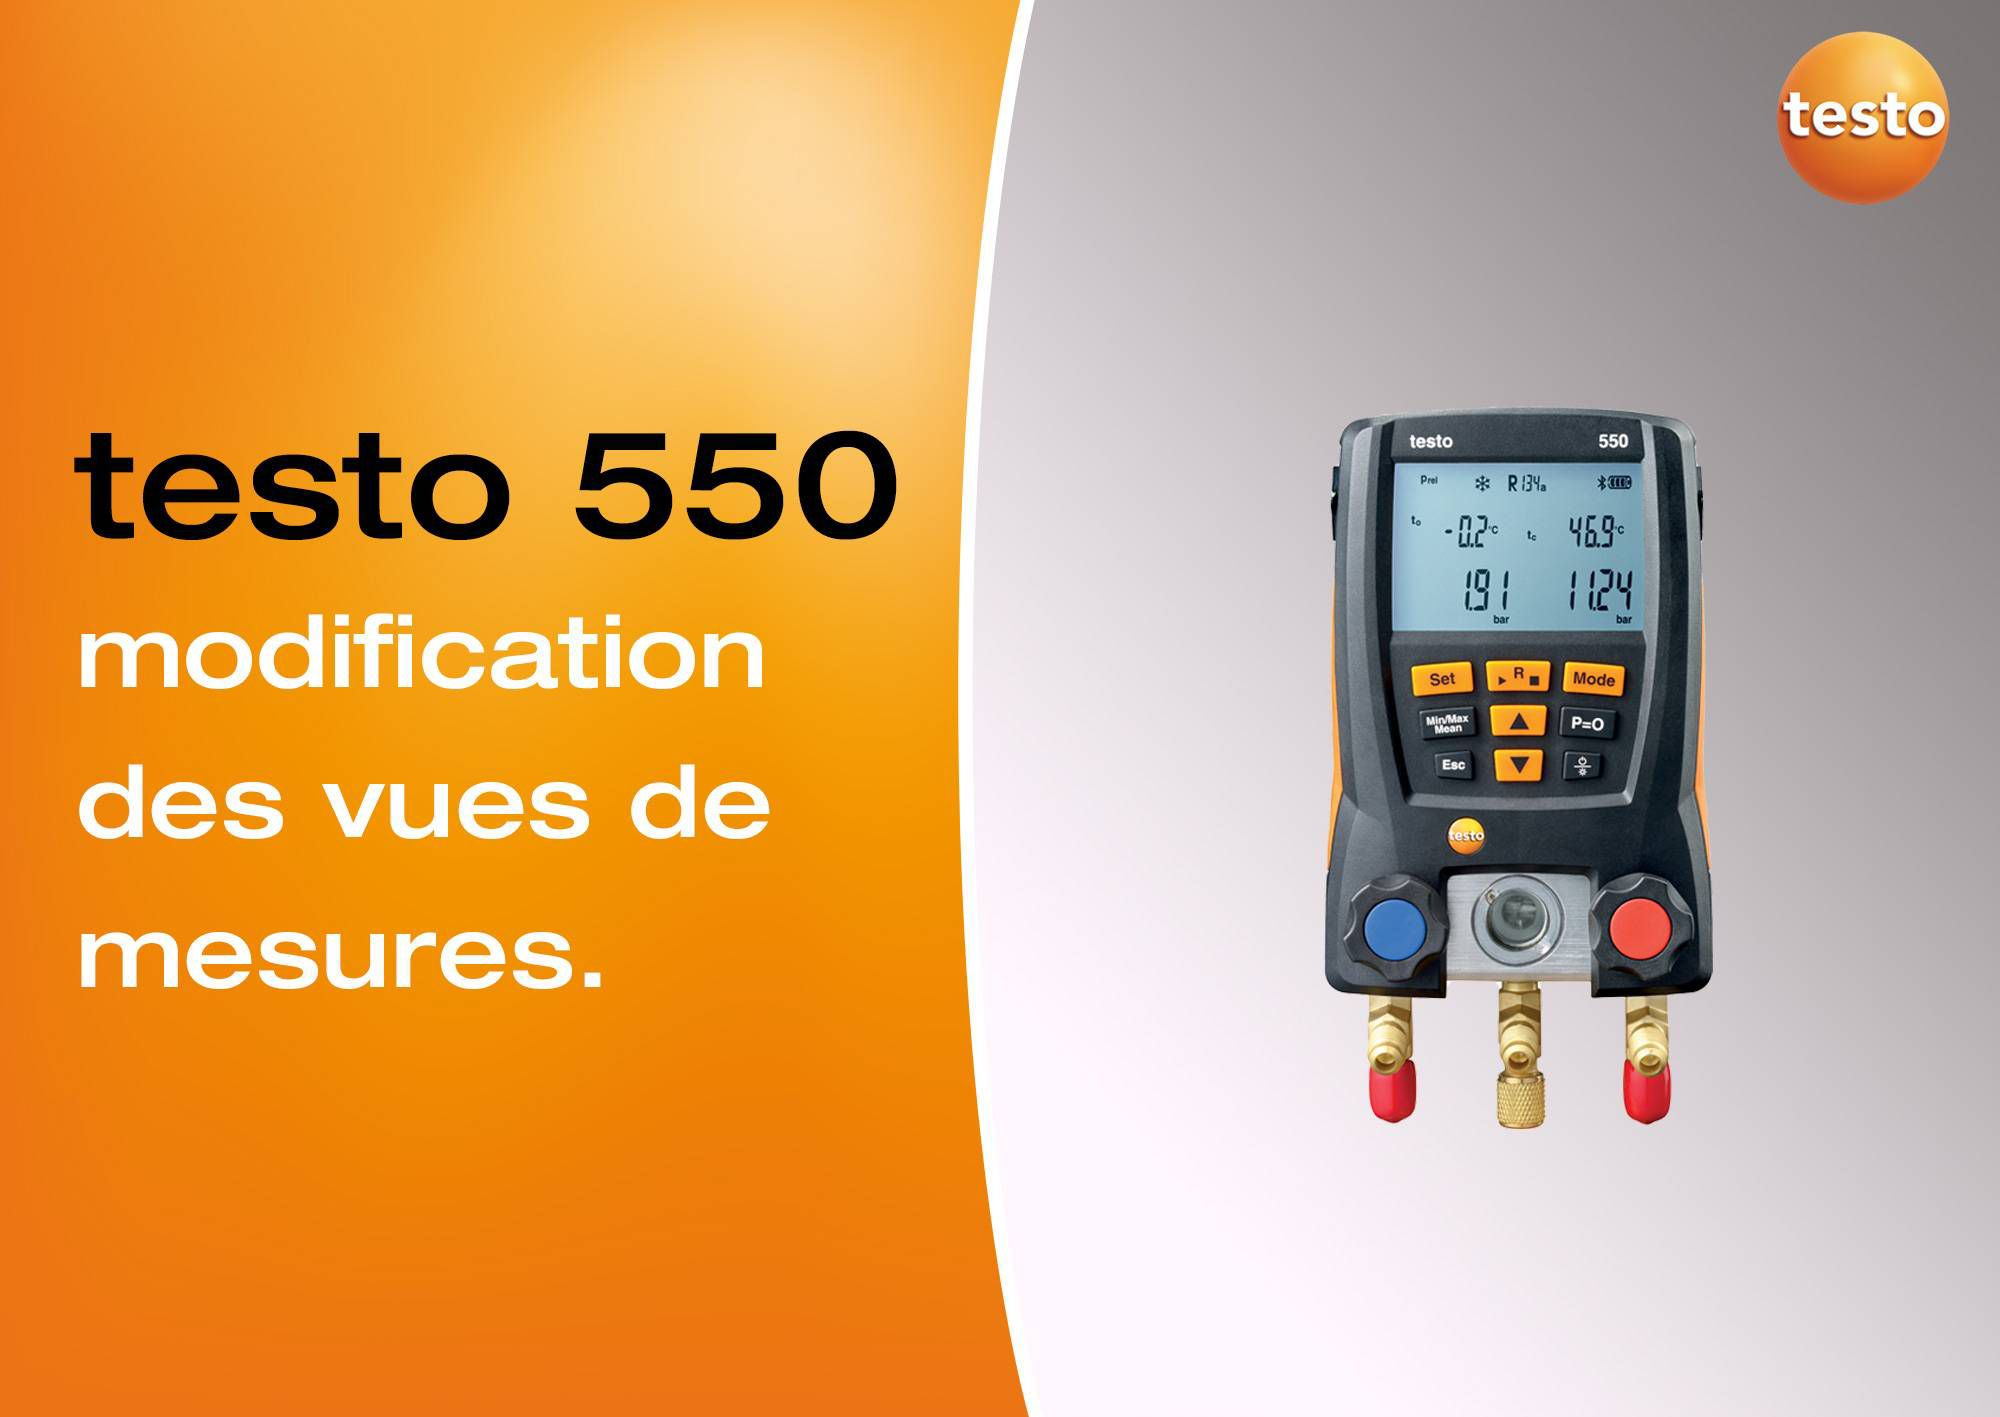 Tutoriel vidéo modification des vues de mesures manomètre testo 550